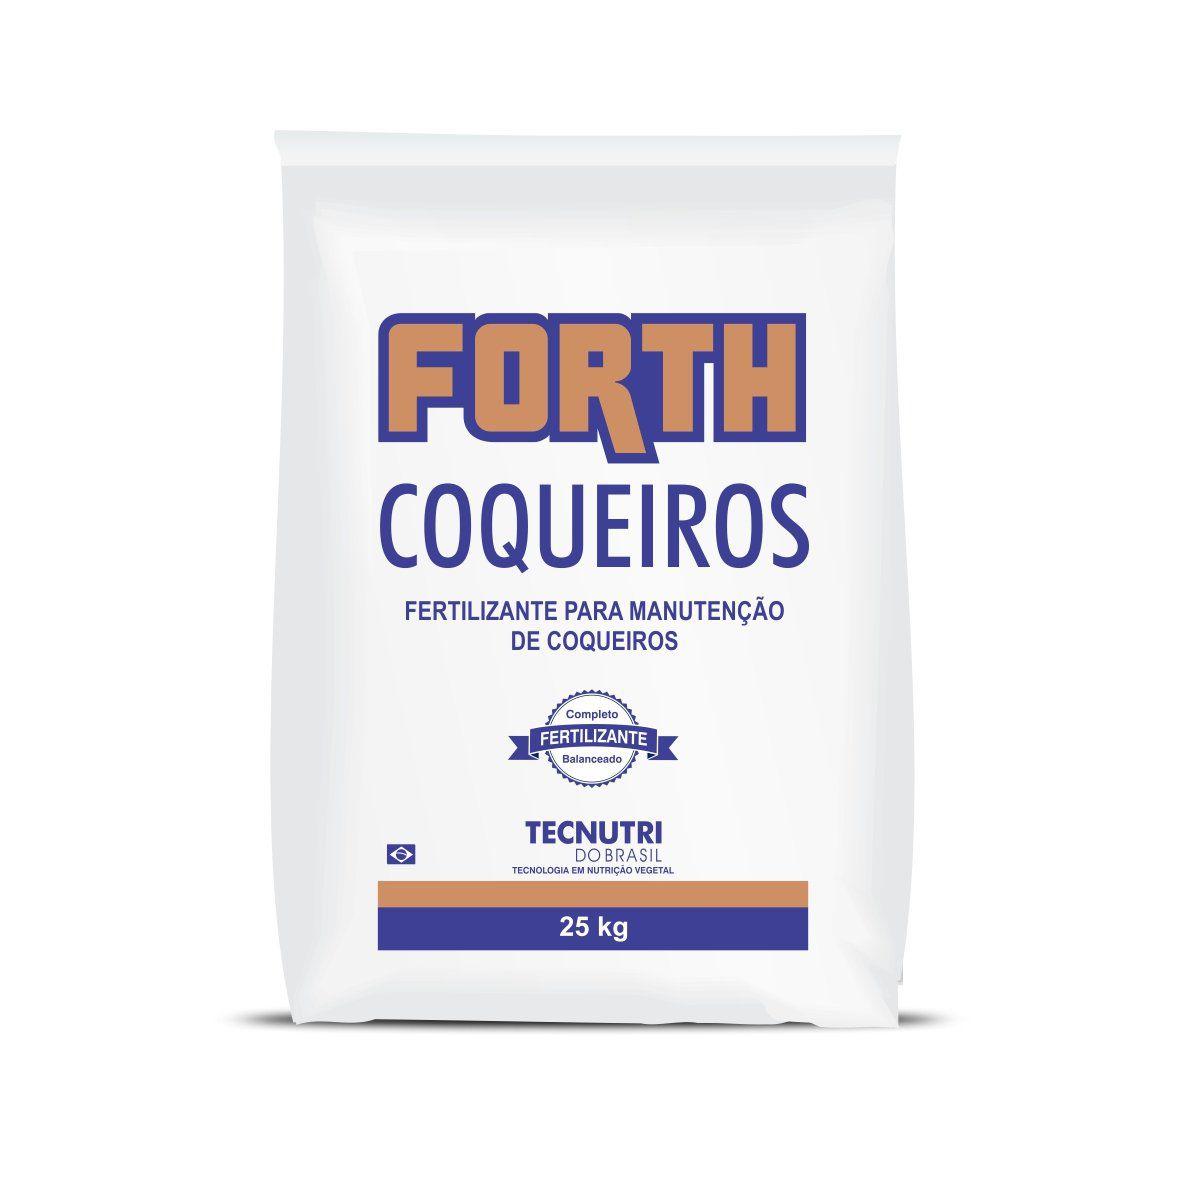 Fertilizante Forth Coqueiros 25 kg